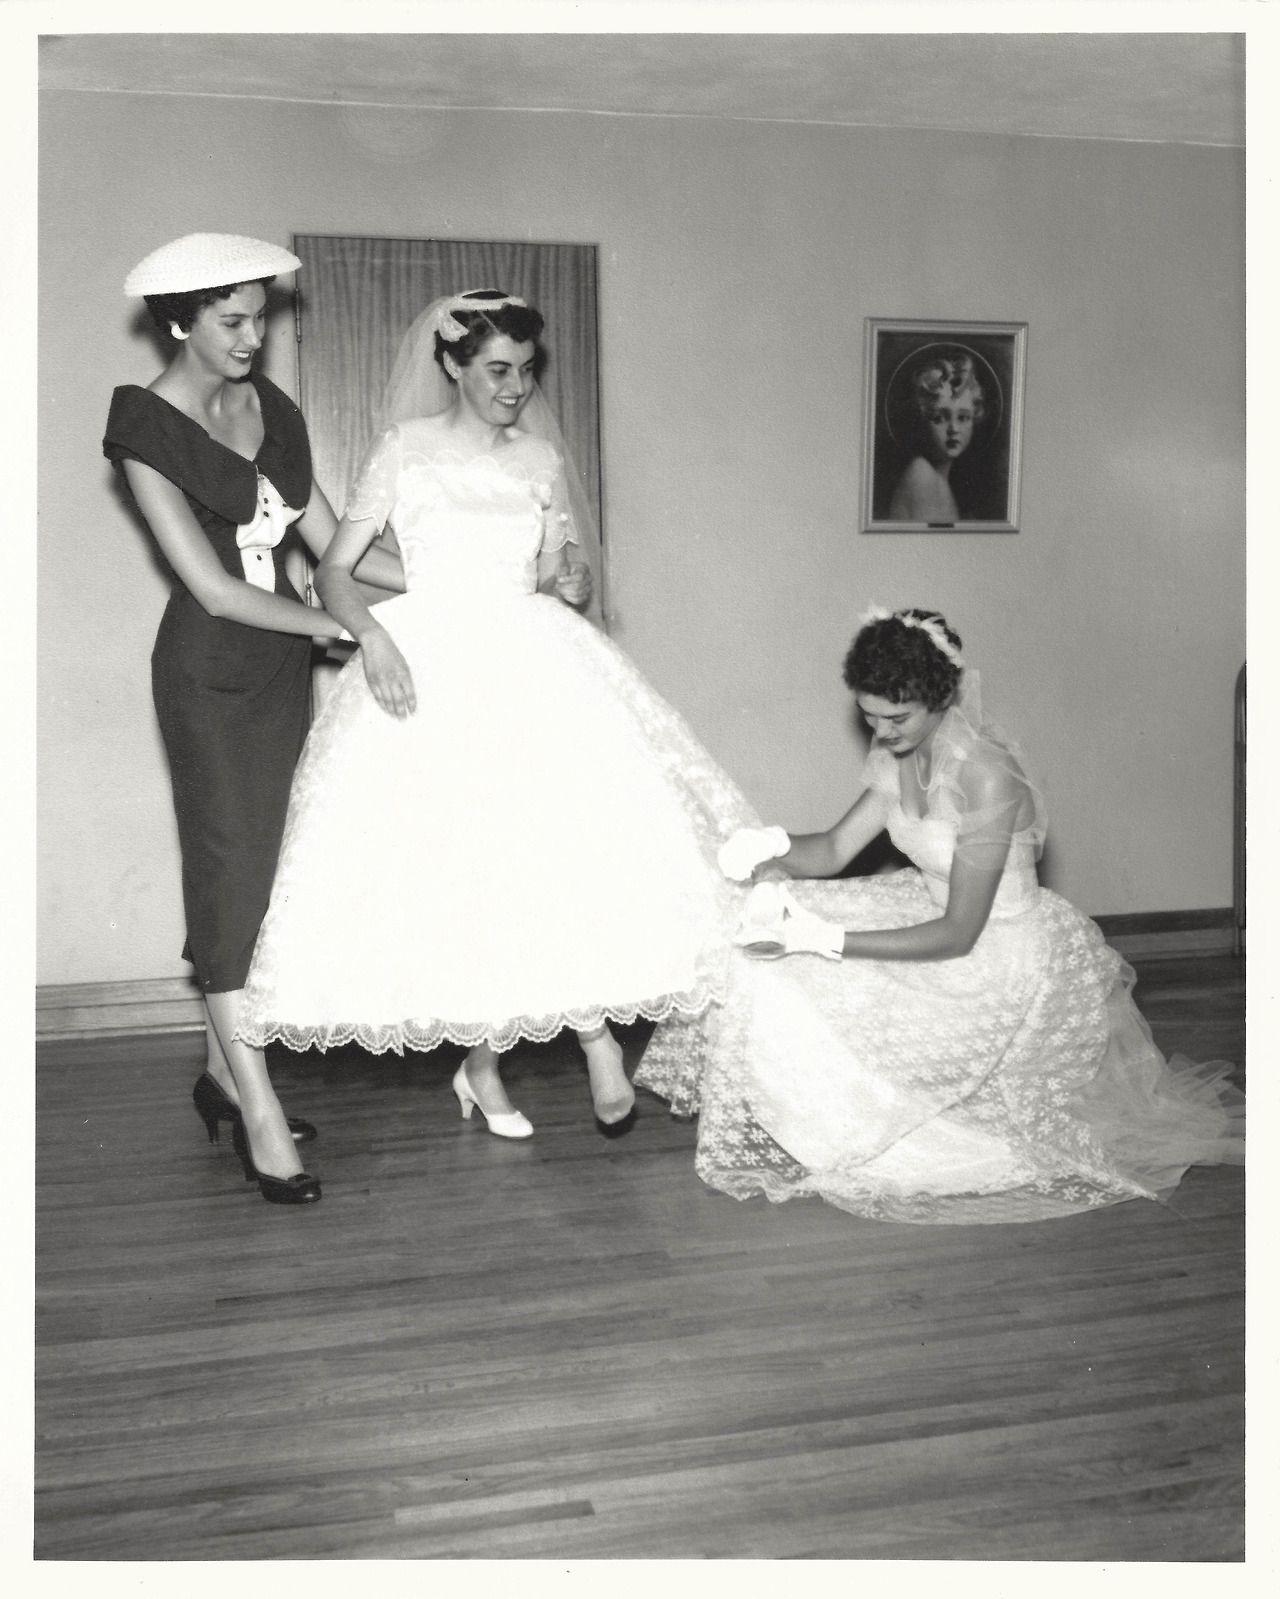 1956... Such a cute vintage wedding photo~